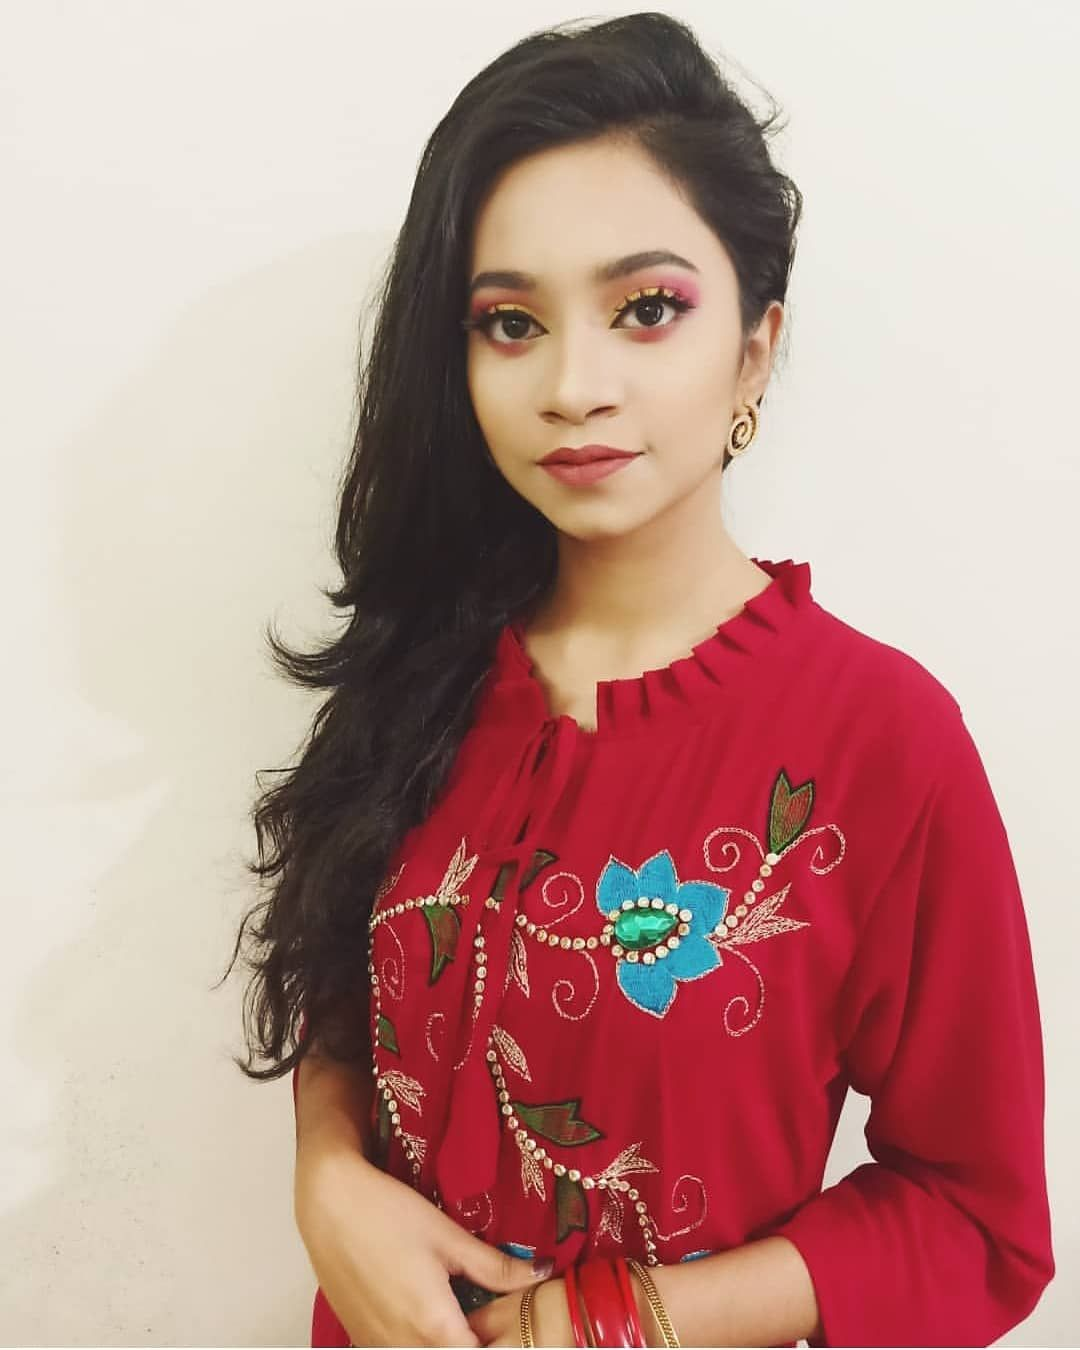 Bengali Divas Selfiestar Bangladesh Follow Like Pics Send Me Your Best Selfie Bengali Divas Selfiestar Bangladesh Follow Fashion Fashionista Women